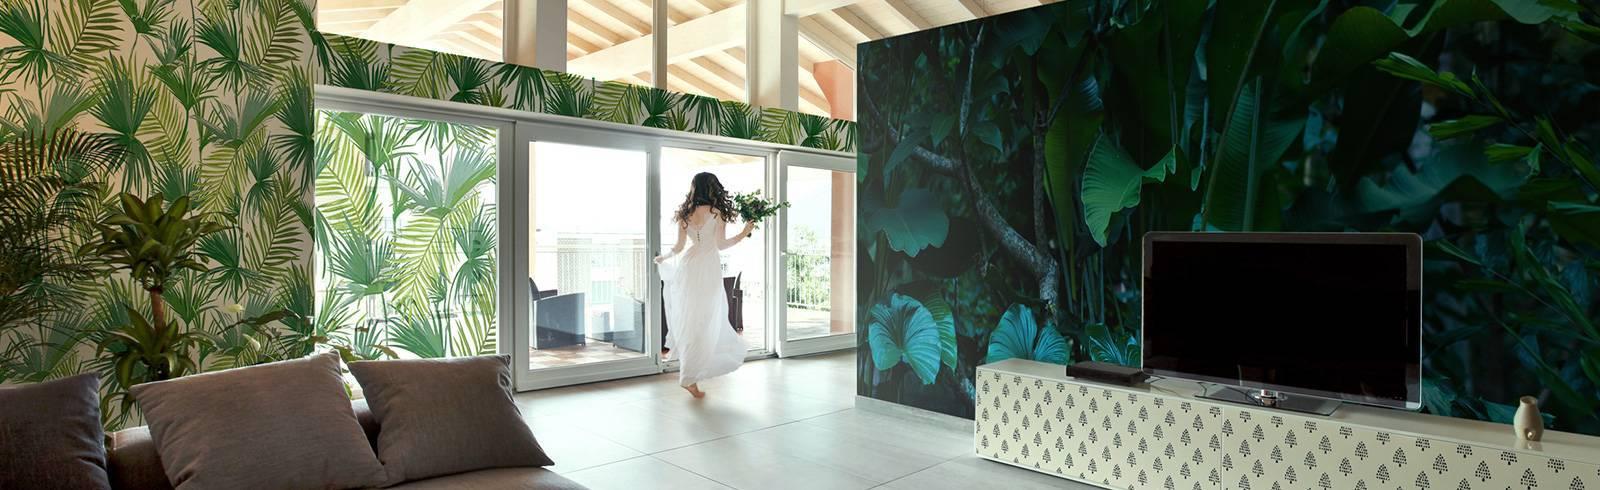 Tapeta, fototapeta i naklejki - Salon w tropikalnym lesie